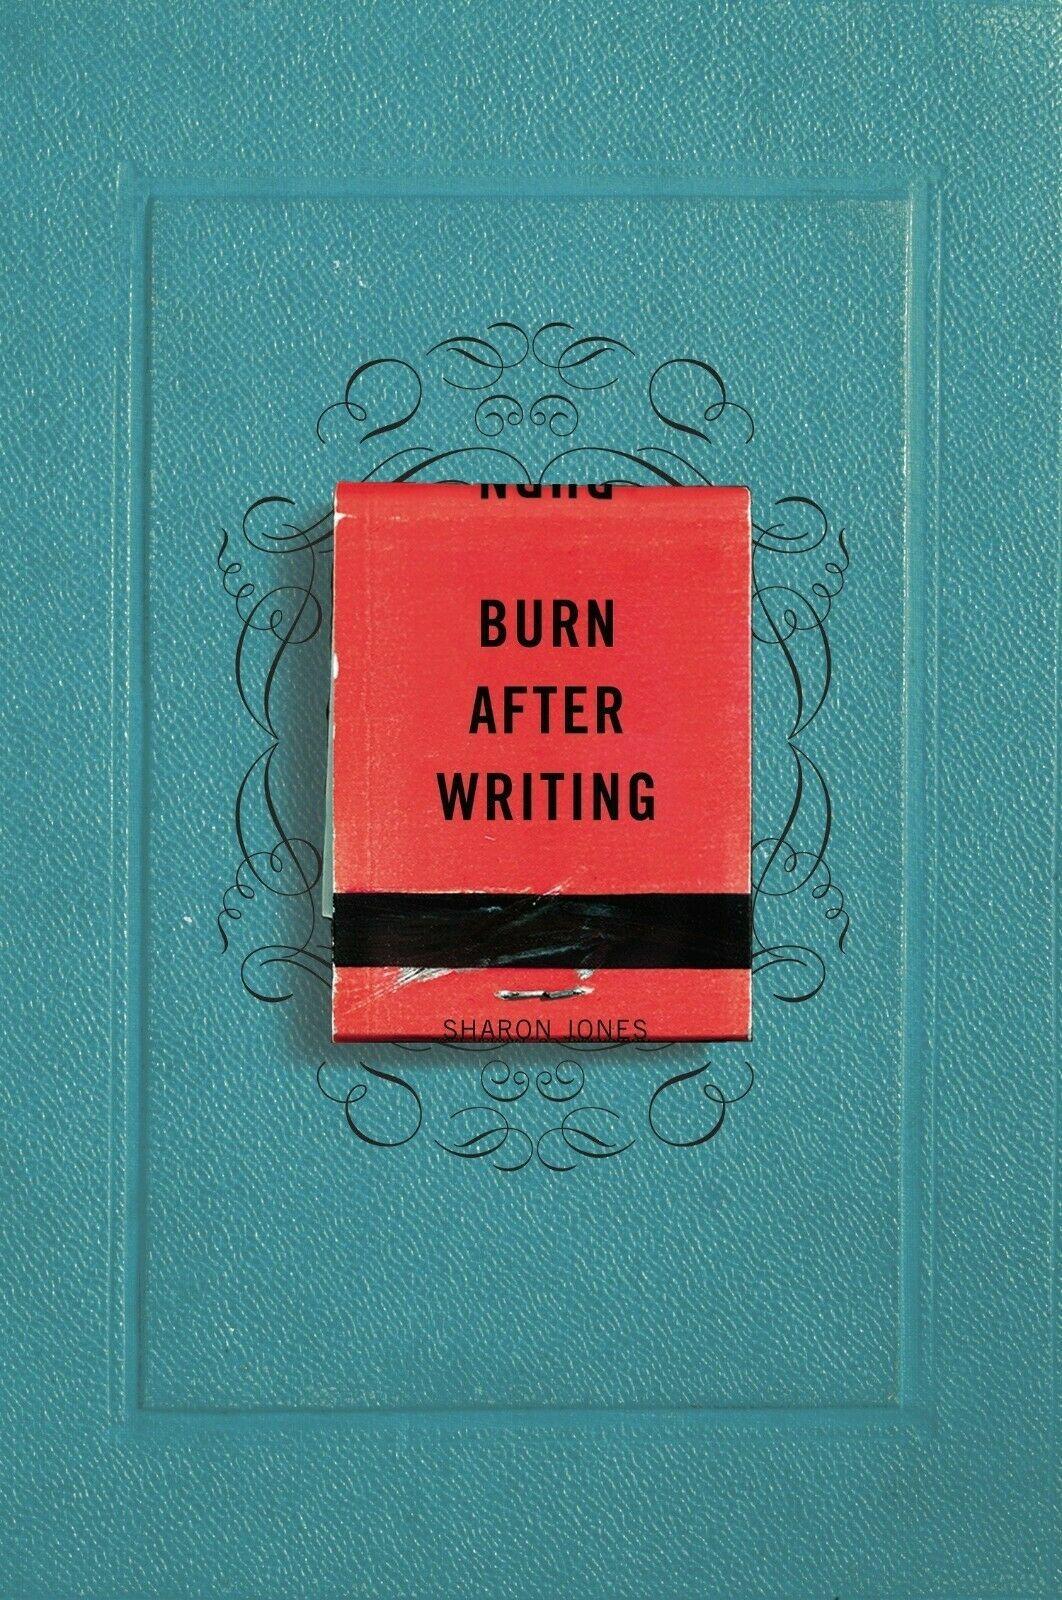 Burn After Writing By Sharon Jones 2015 Digital P D F In 2020 Sharon Jones The Secret Book Burns